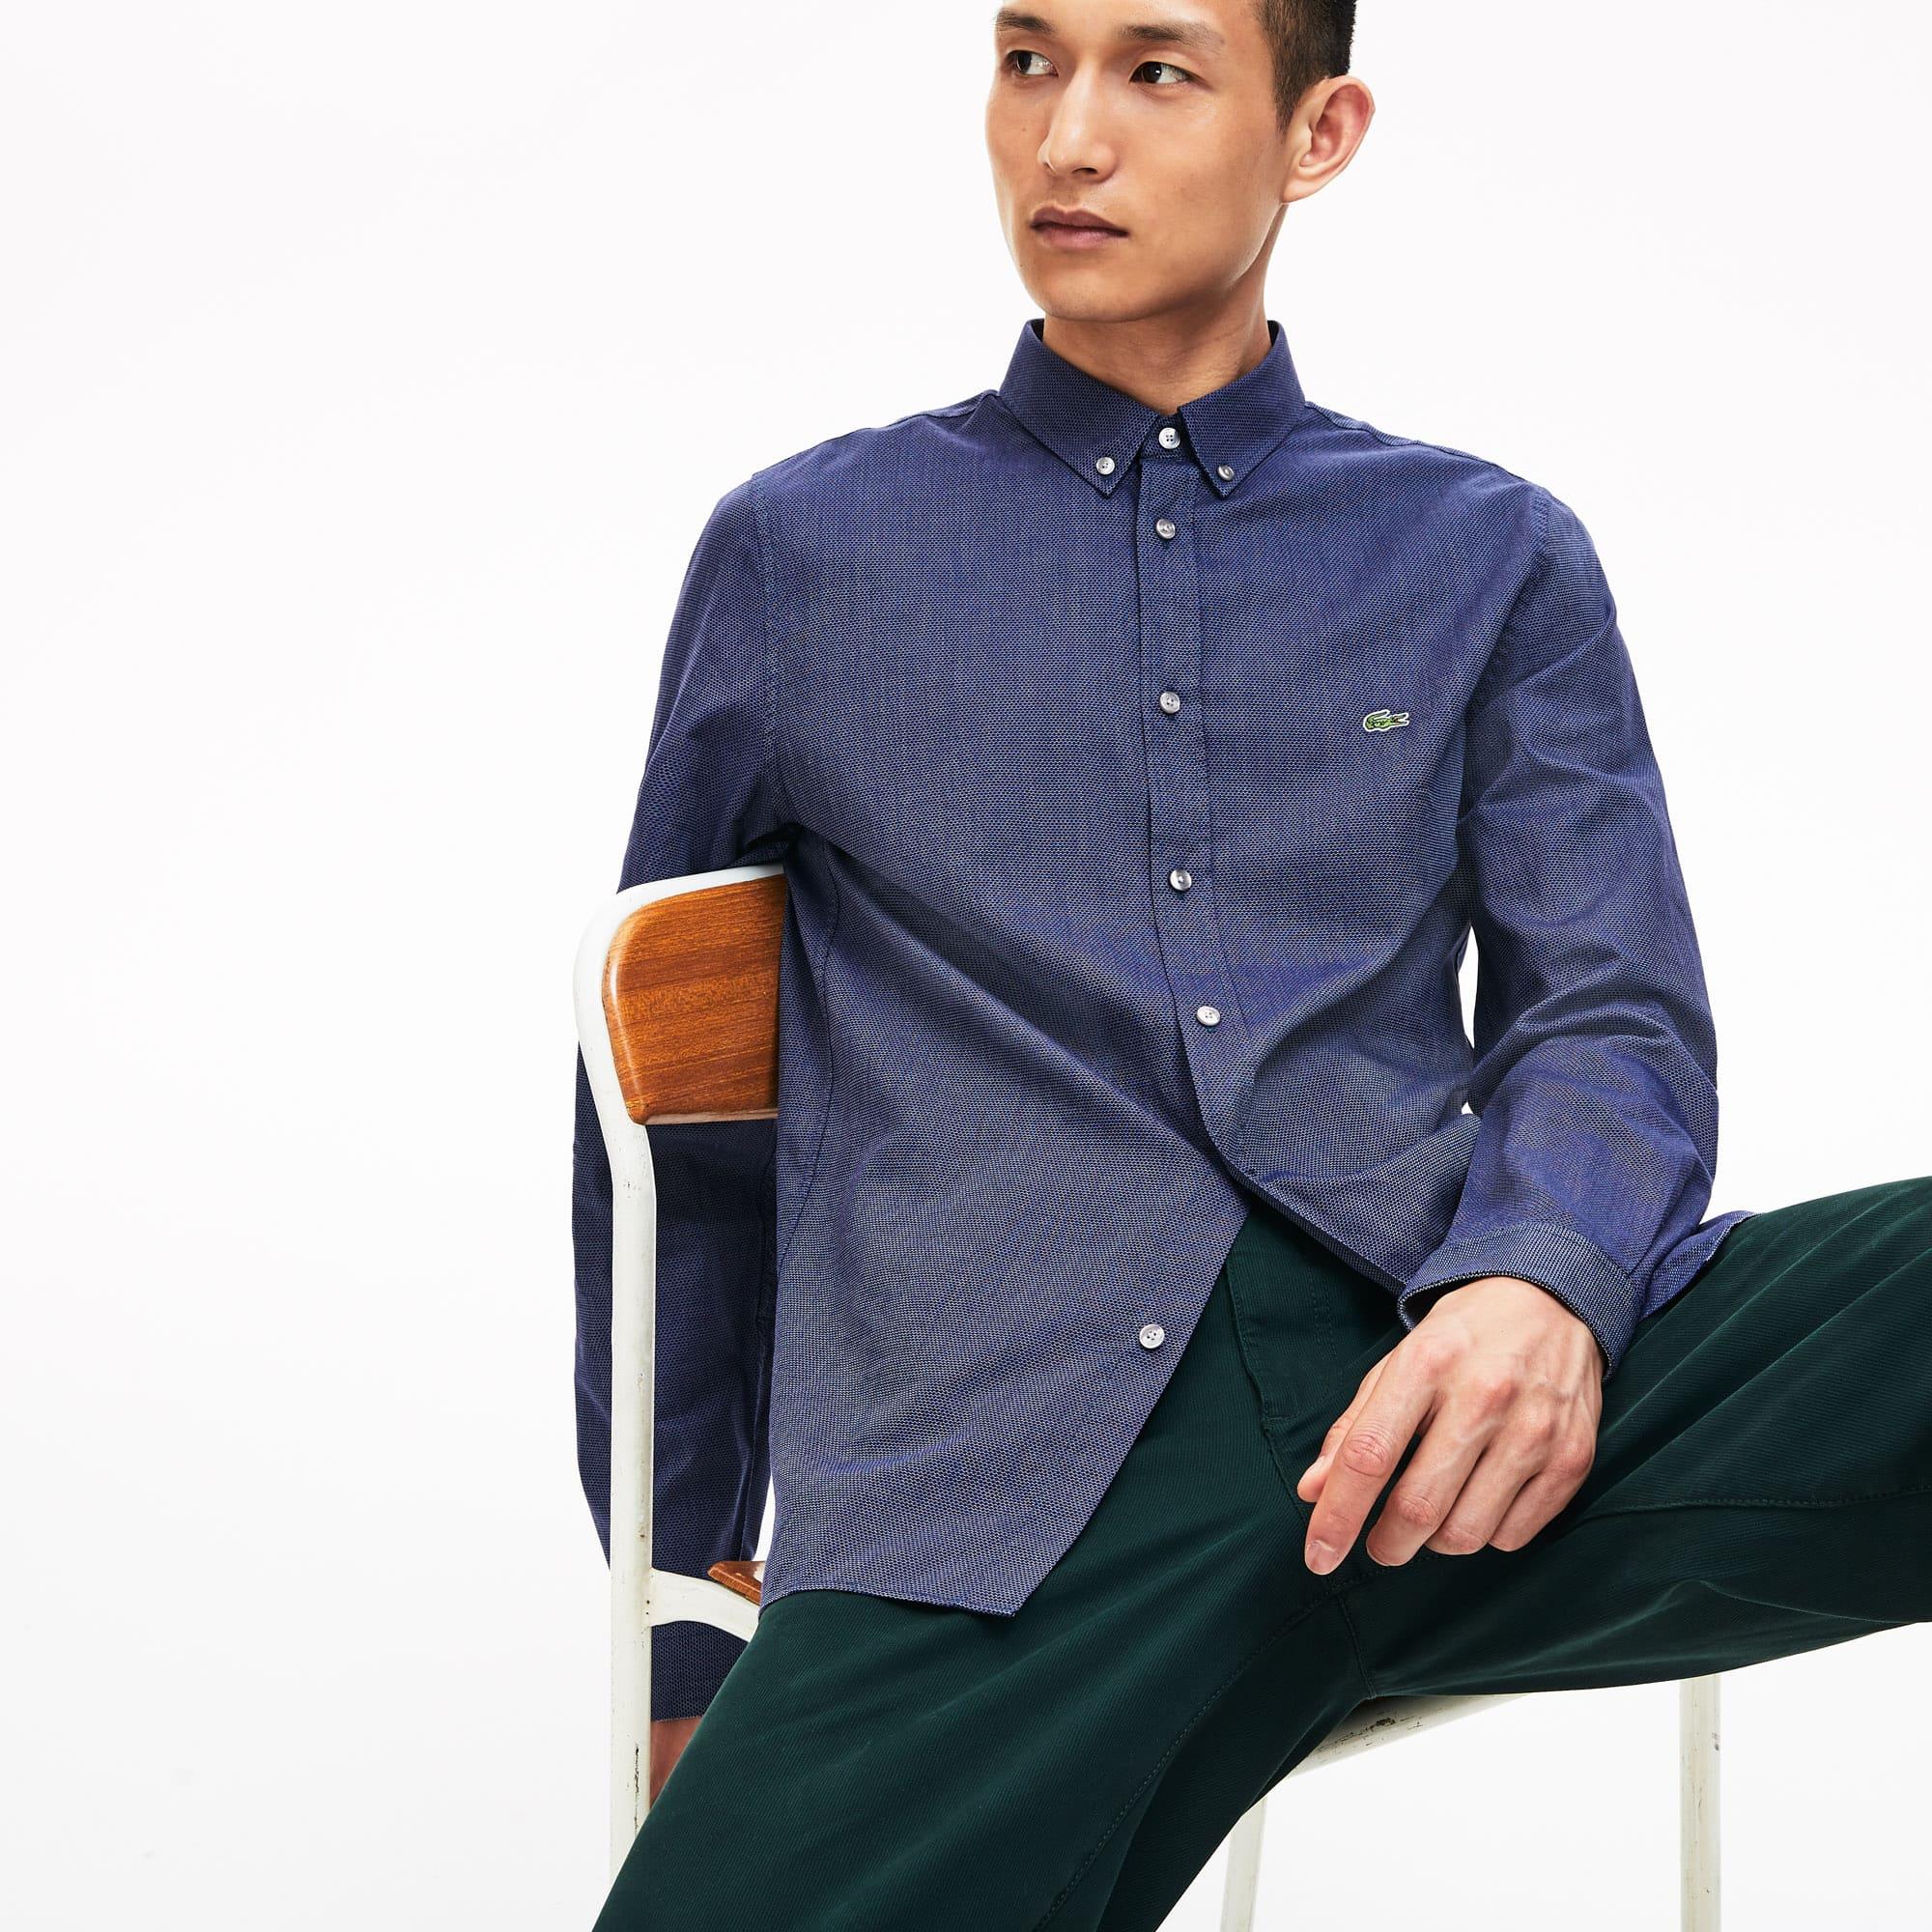 Lacoste Tops Men's Slim Fit Polka Dot Cotton Poplin Shirt